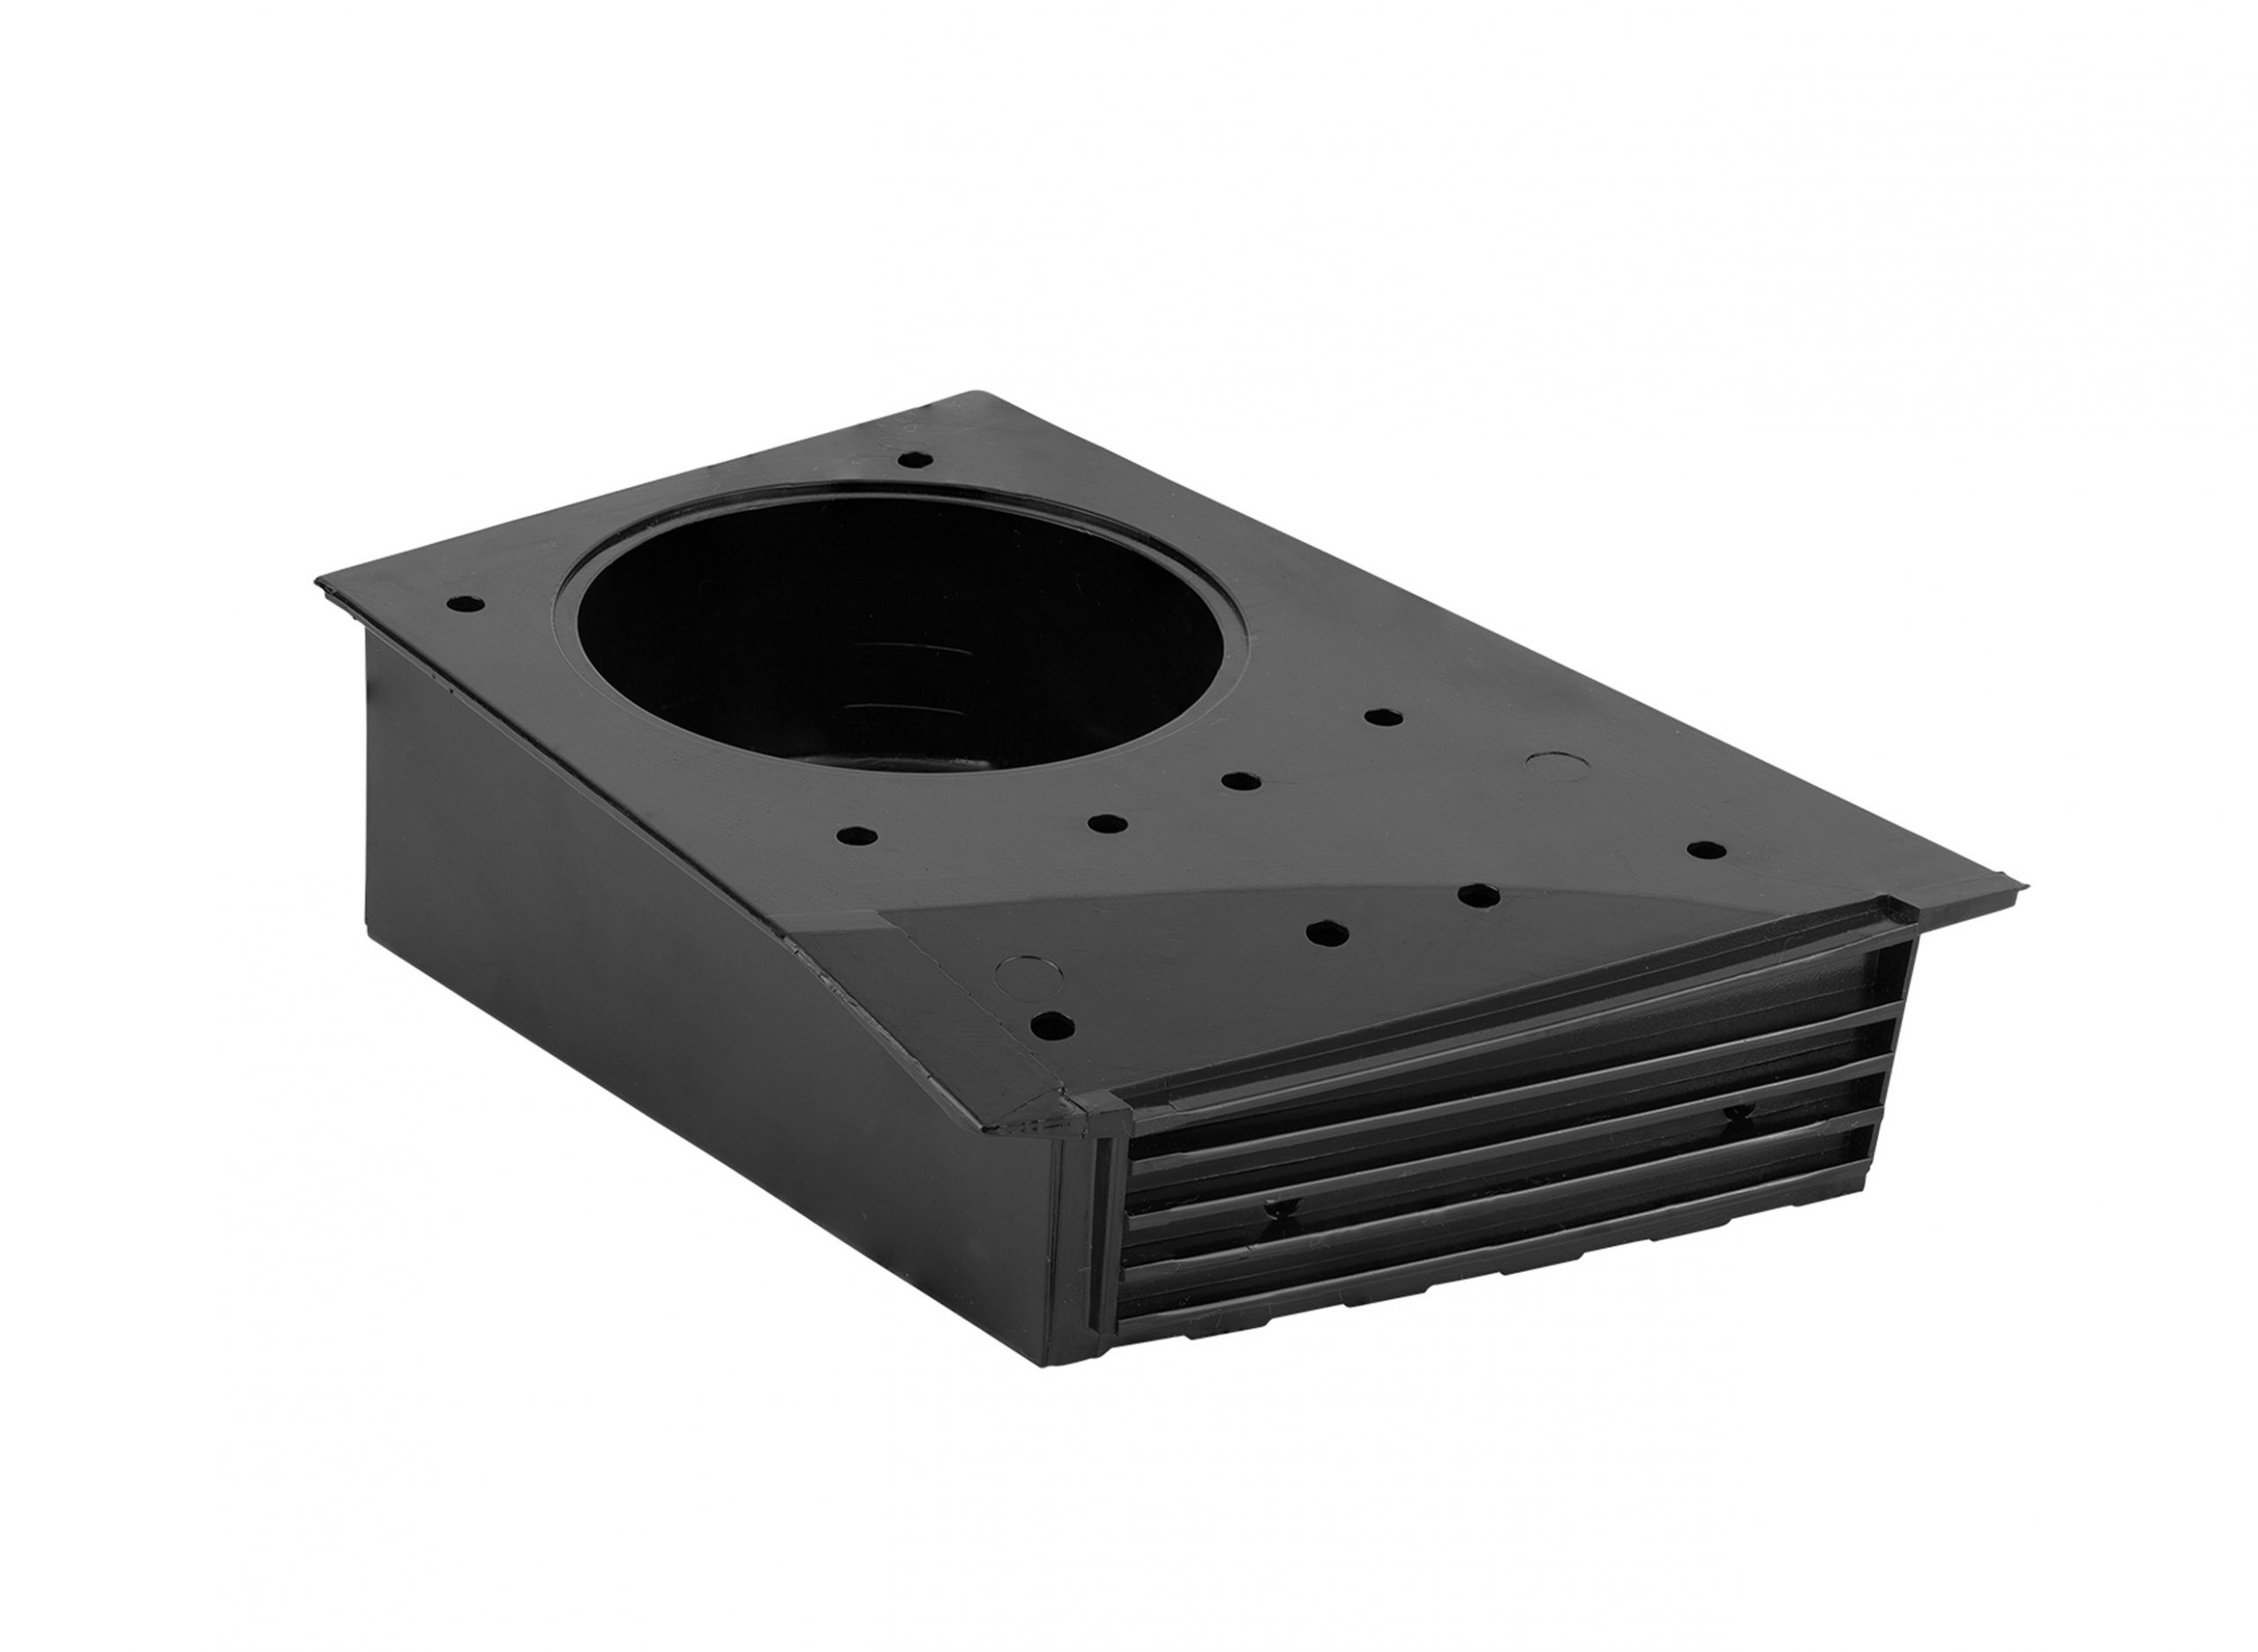 prifer-mold__0018_prifer-mold_40_0005_prifer-mold_77_0021_prifer_plastic_38